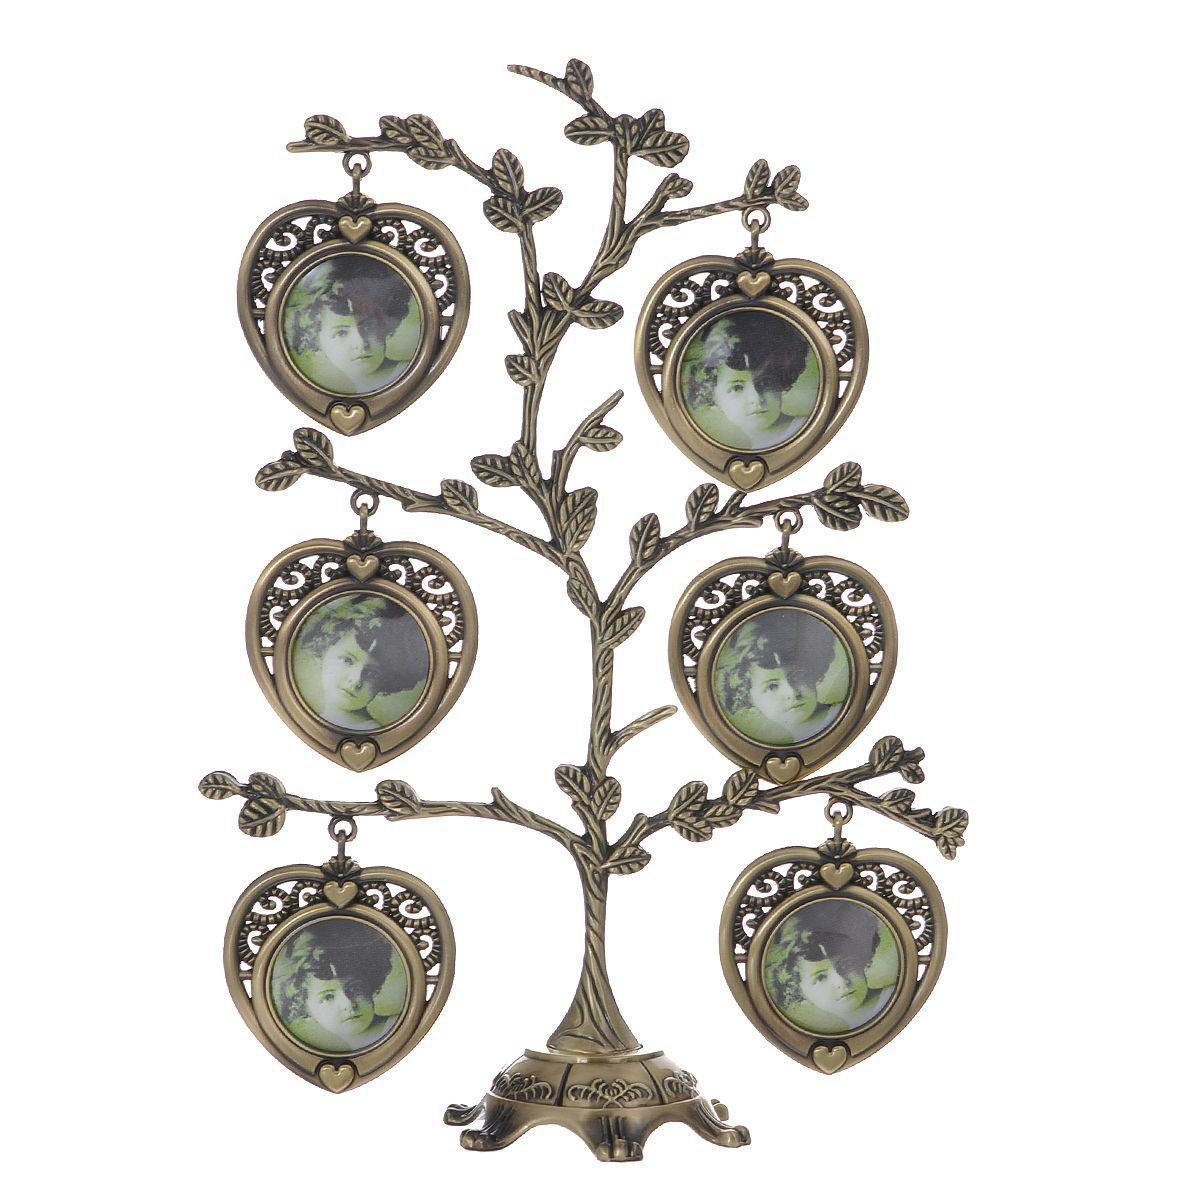 Декоративная фоторамка-дерево Сердце, цвет: бронзовый, на 7 фото, 4 х 4 см 264062